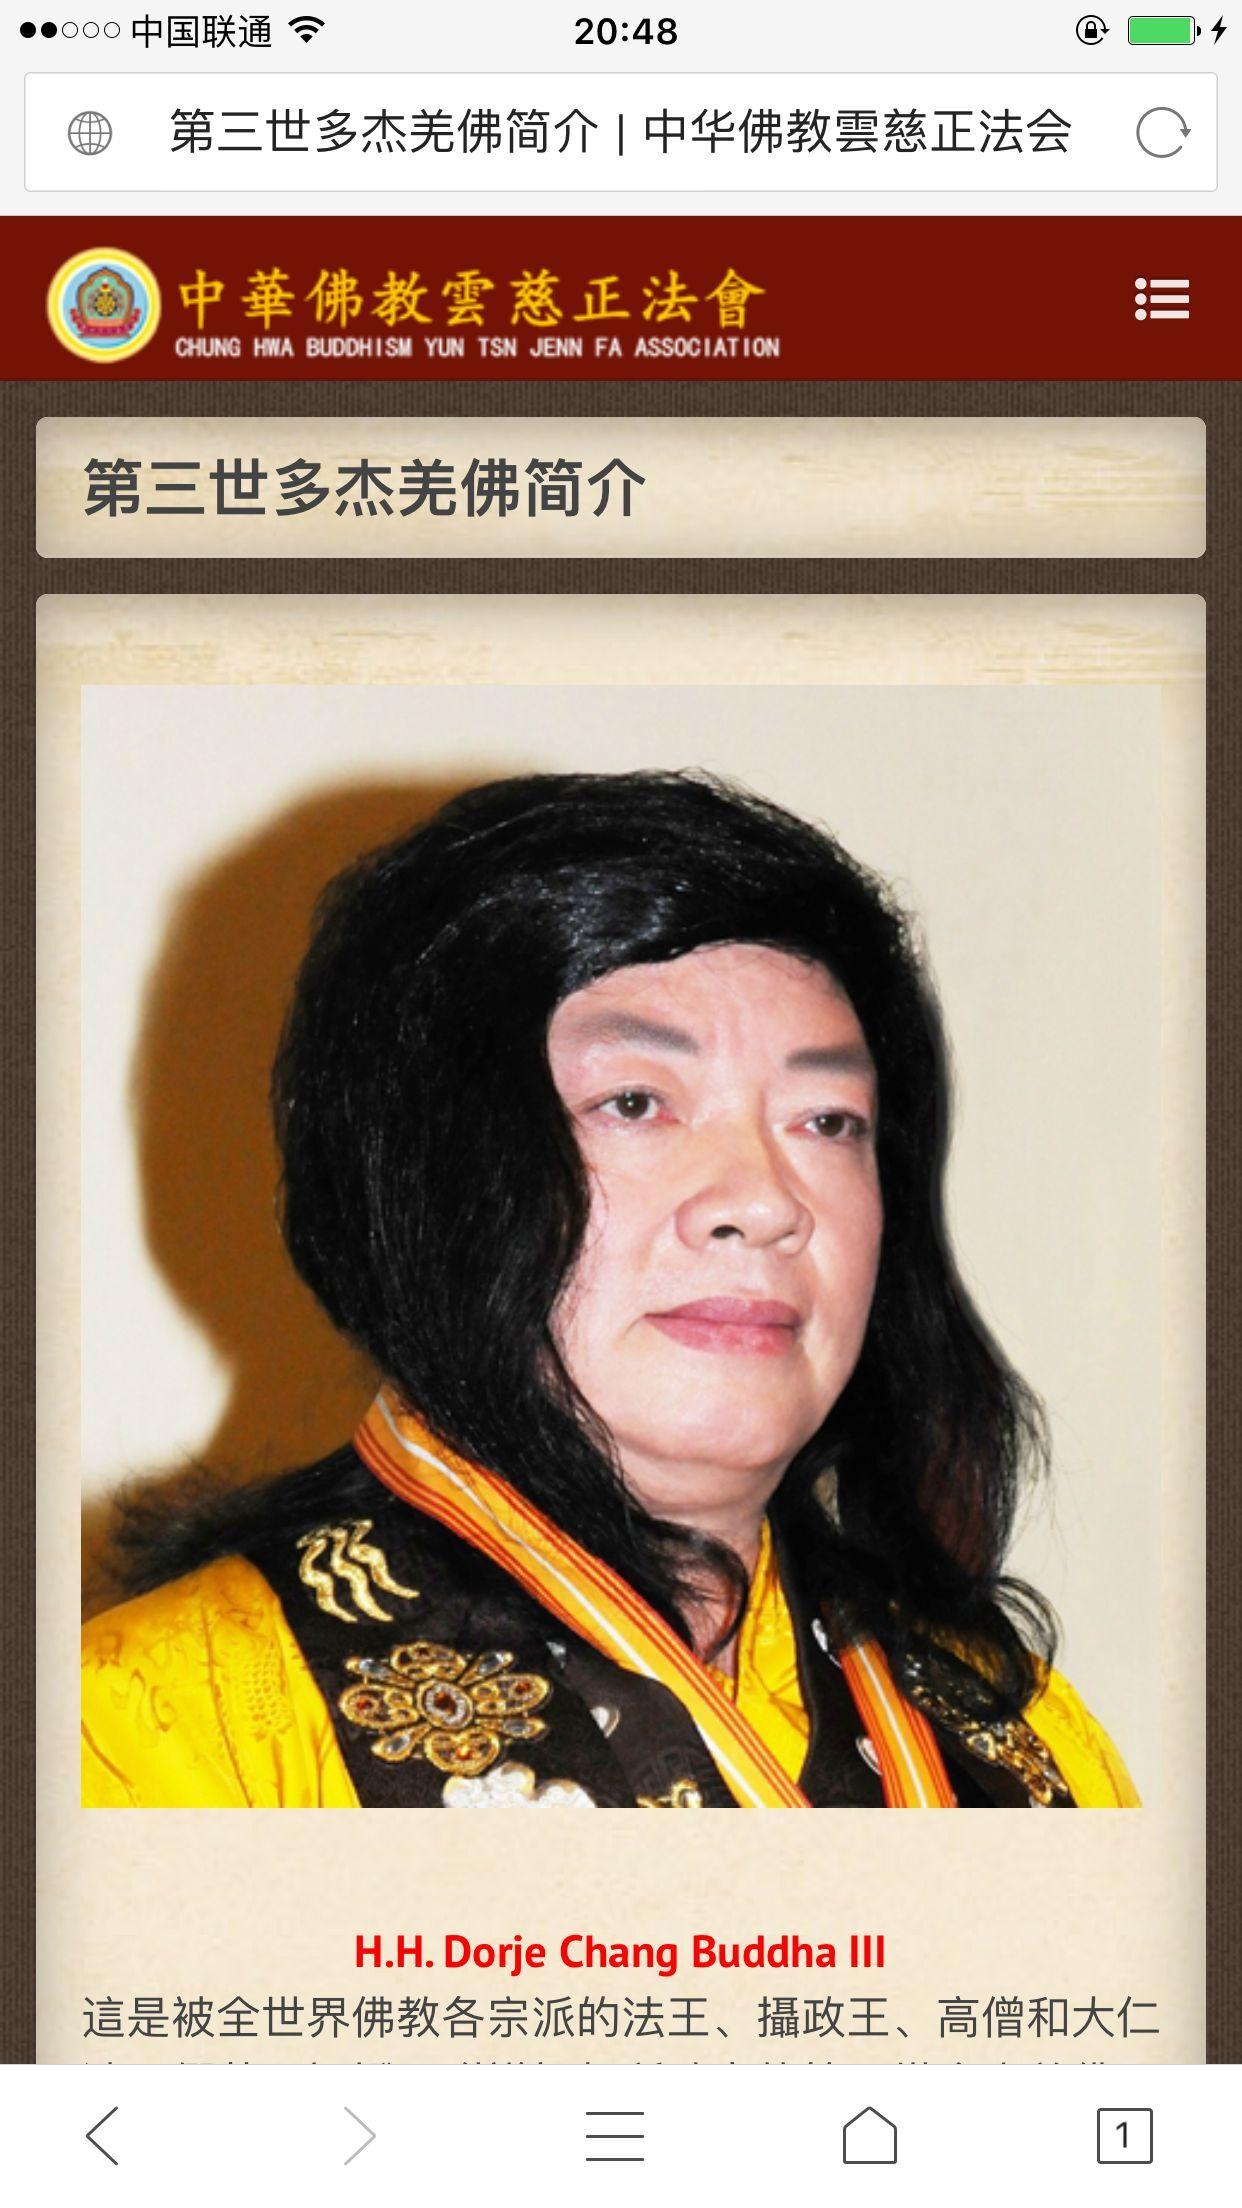 m3 中华佛教云慈正法会(台湾)